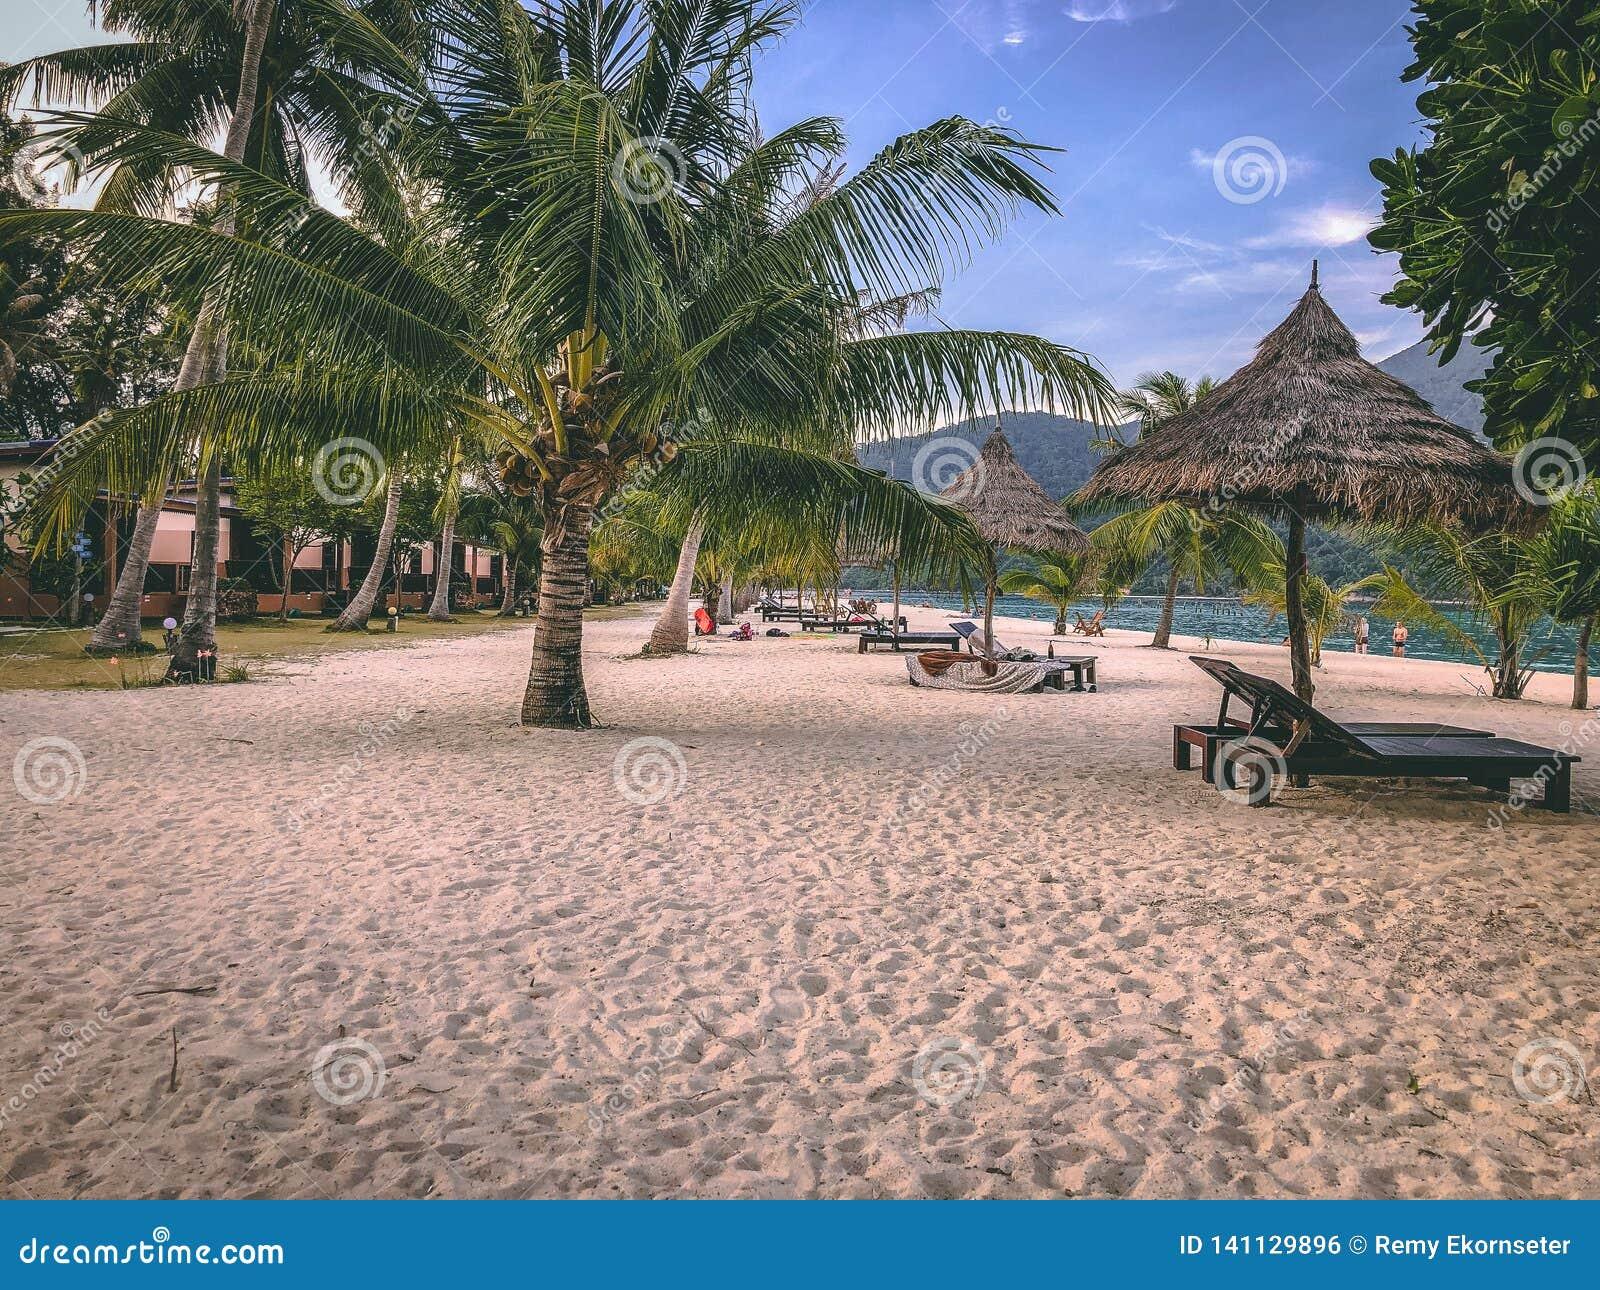 Isola Crystal Clear Sea, blu, palme di Paradise, su fyre